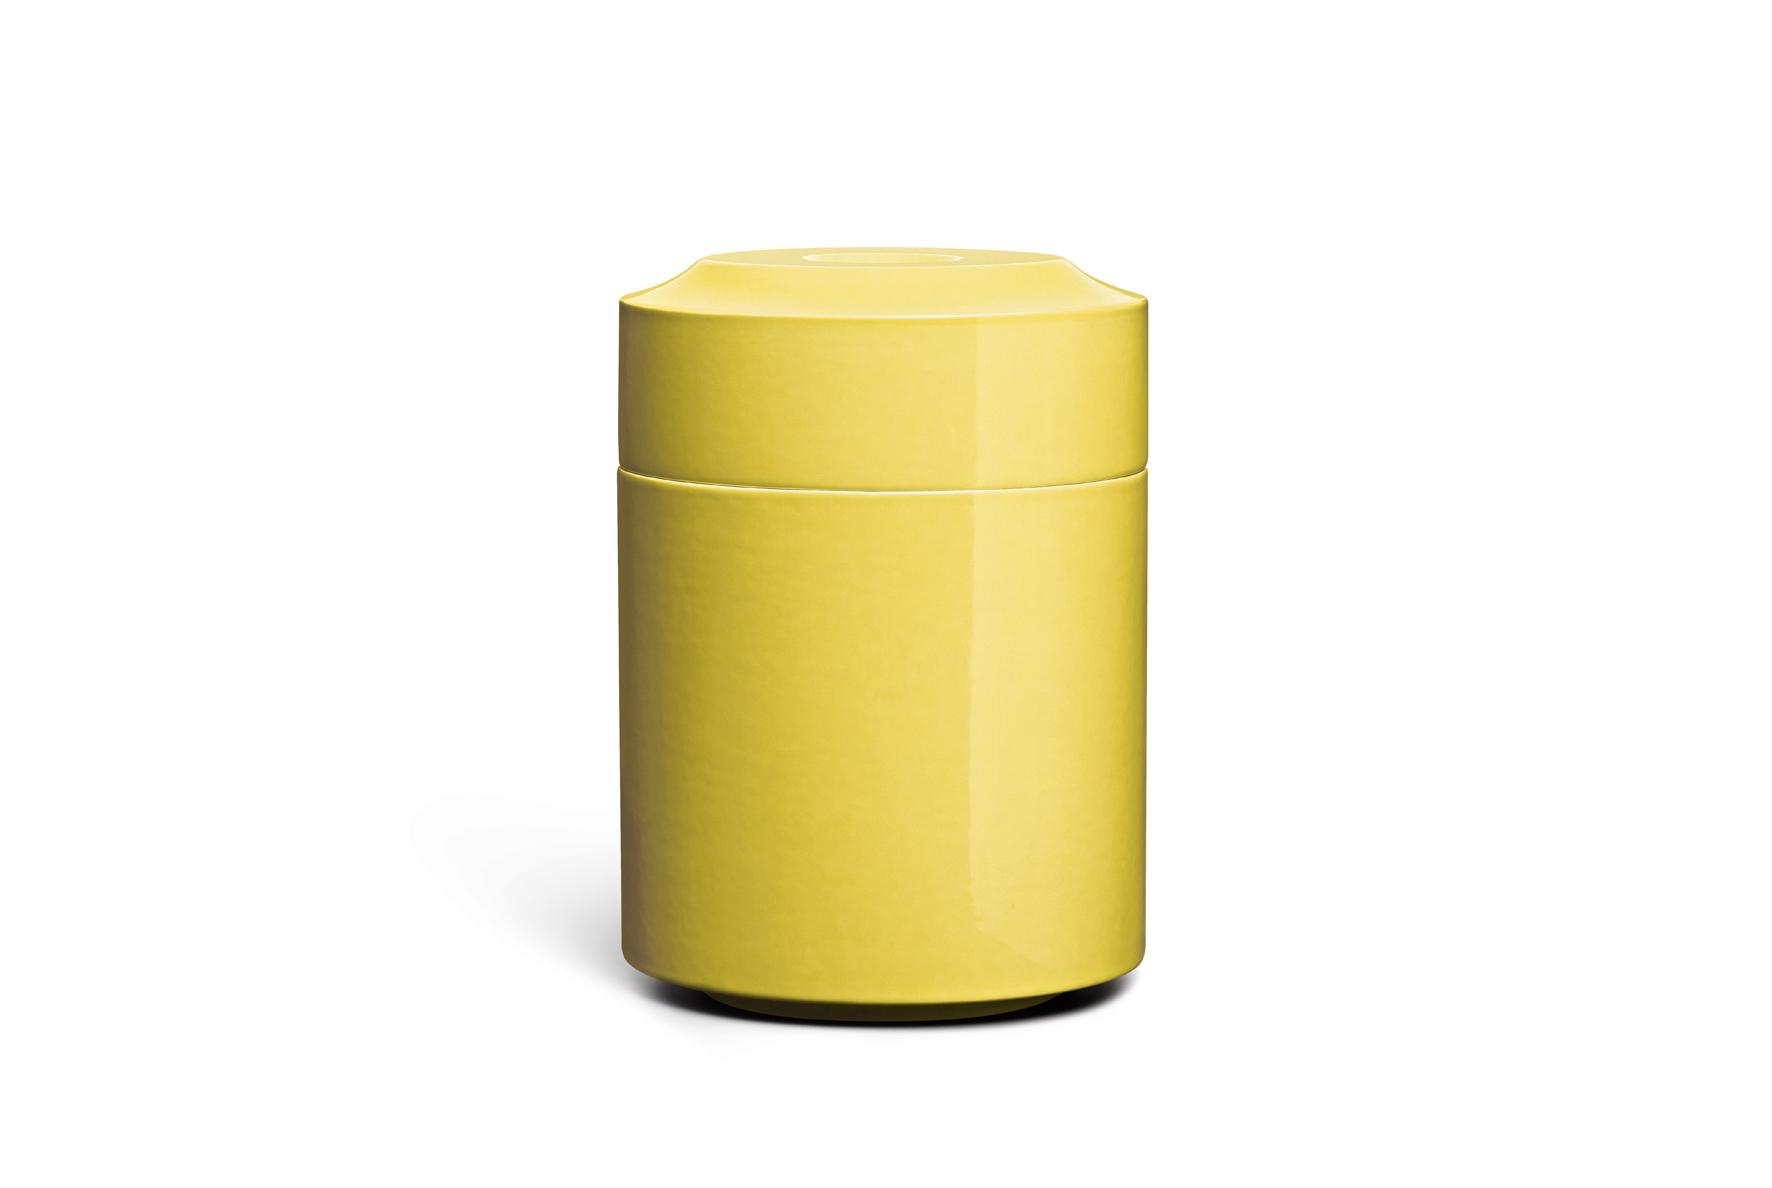 Keramik / glasiert / glänzend<br />Farbe: sun <br />H 29cm, DM 21cm